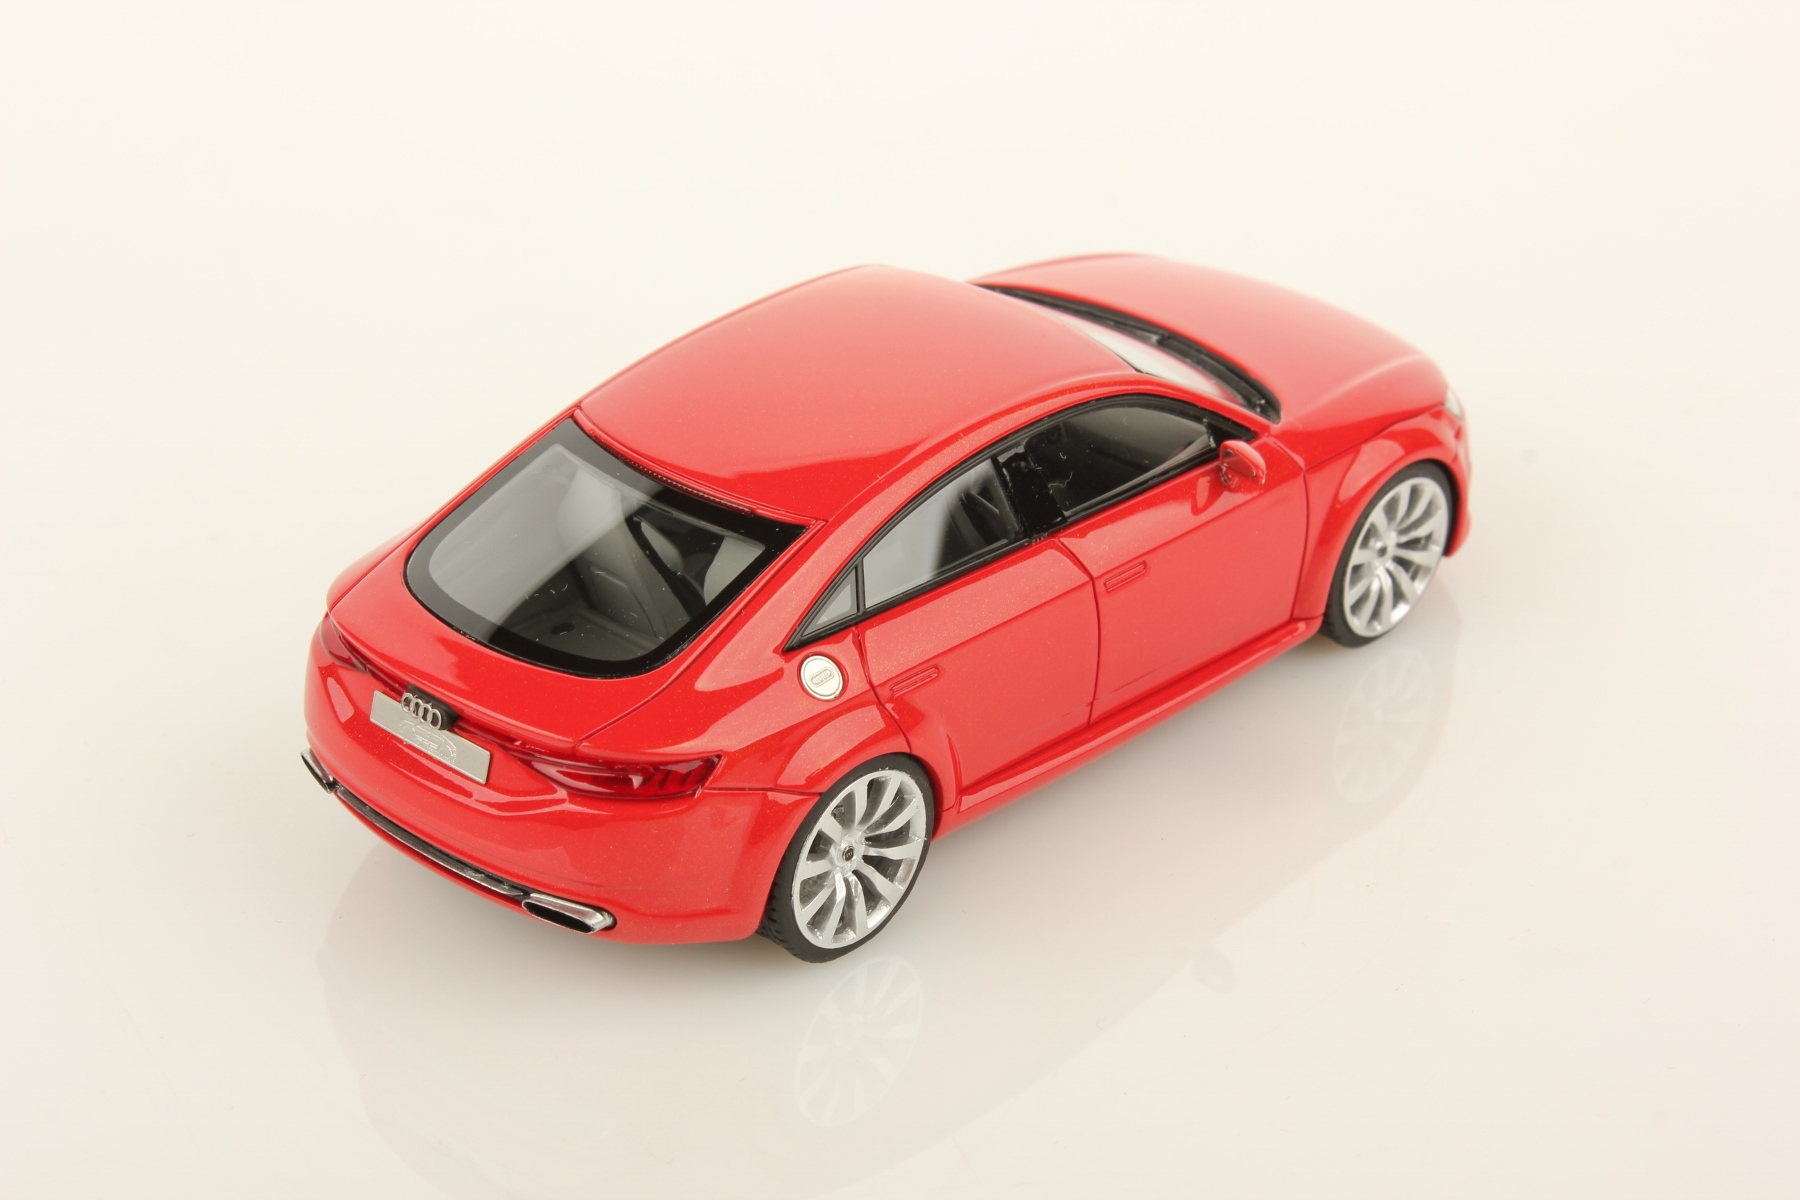 LSAUDITTSB Audi TT Sportback Concept Scale 1 43 c